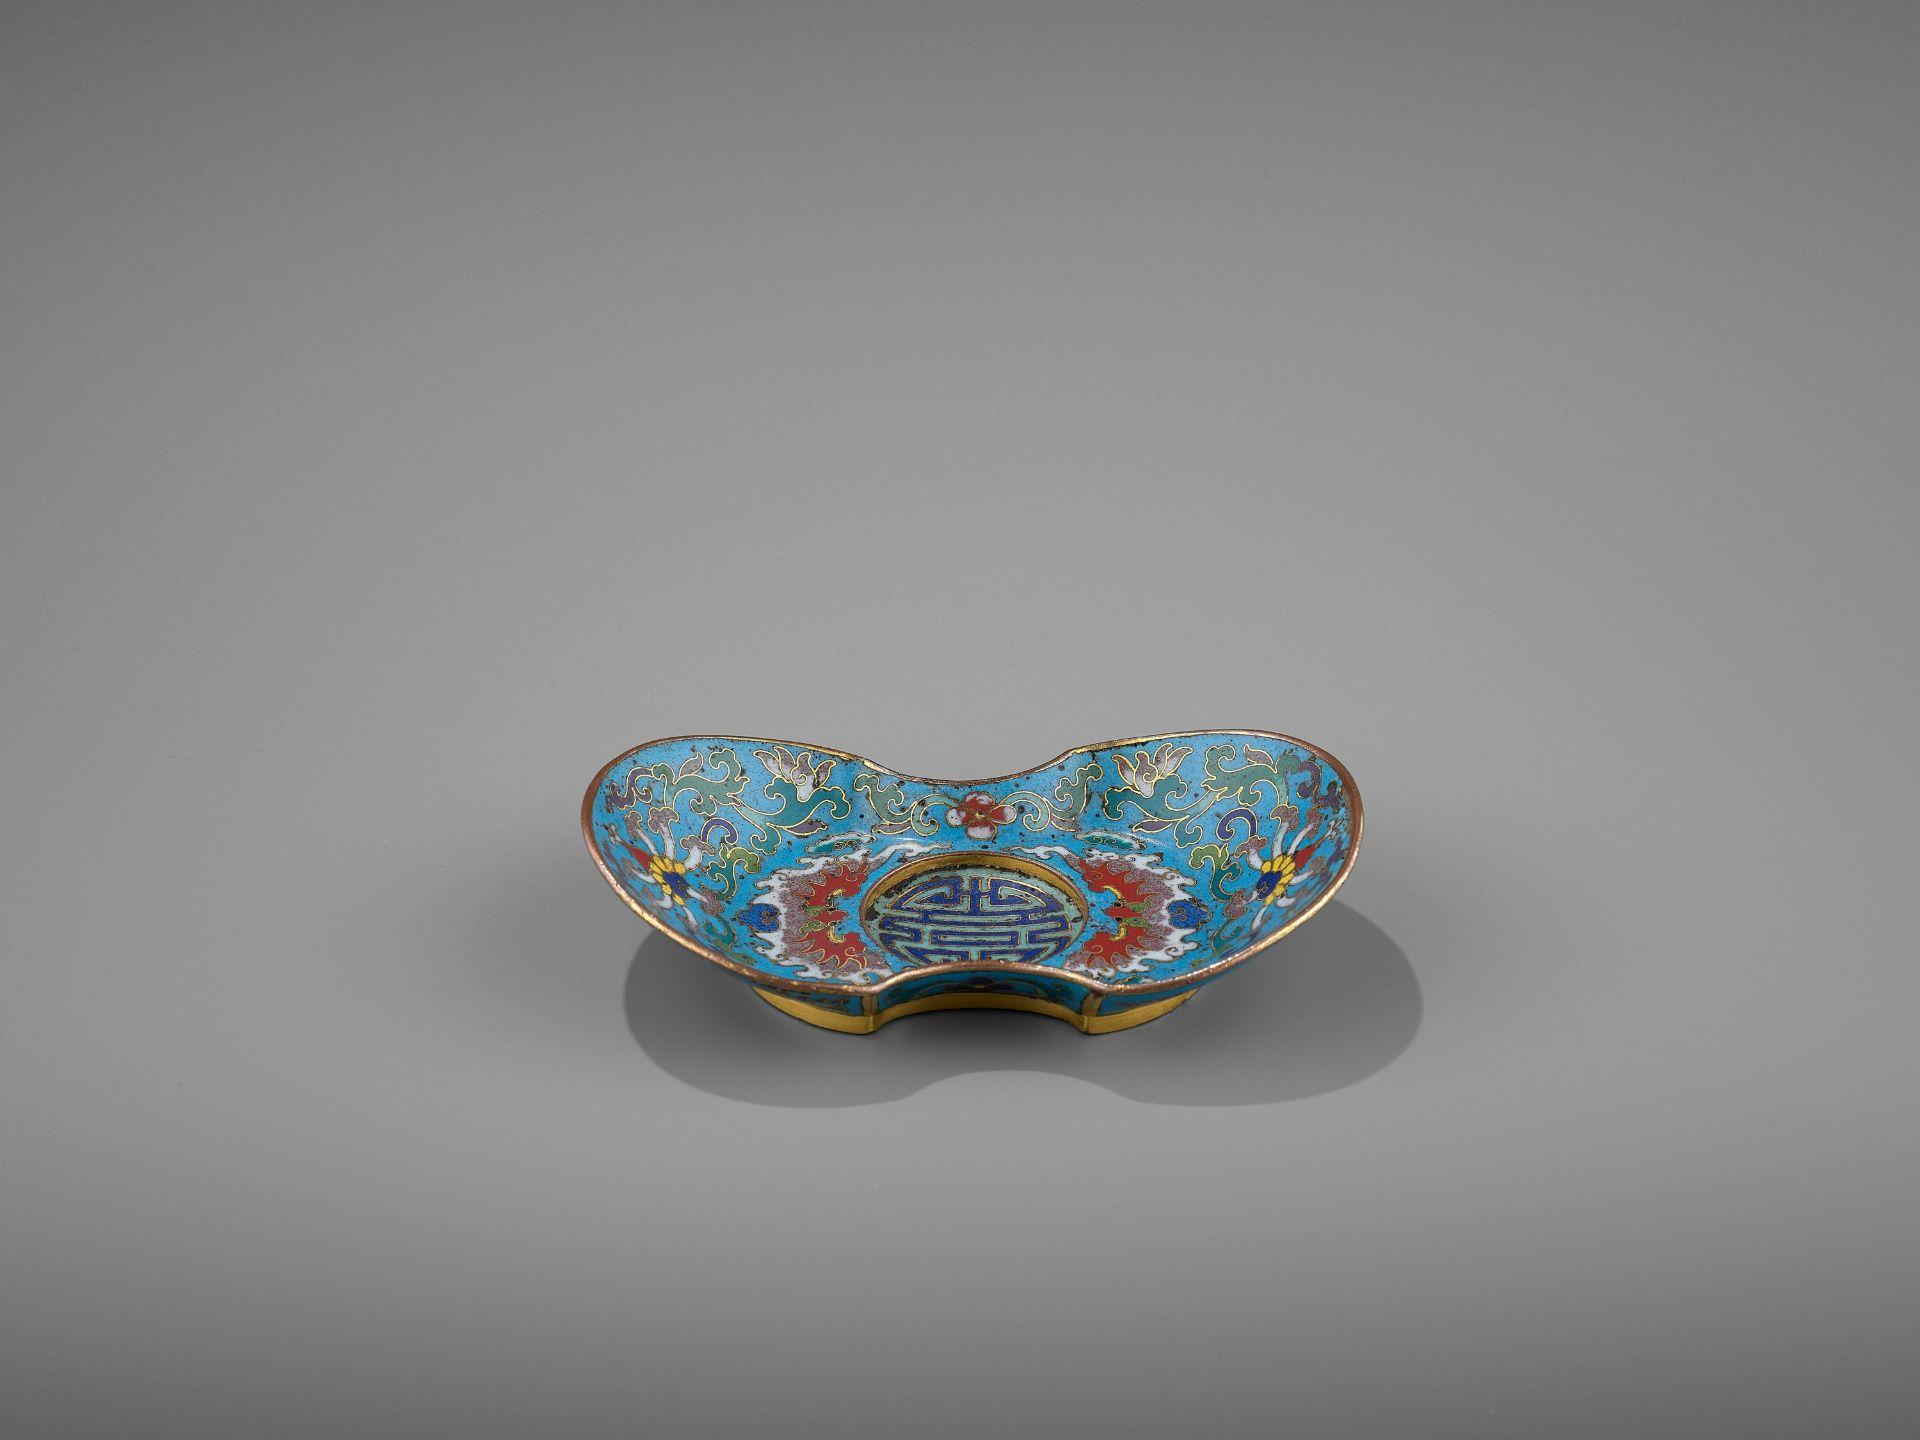 A CLOISONNE AND GILT-BRONZE 'DOUBLE HAPPINESS' CUP STAND, QIANLONG - Bild 5 aus 10